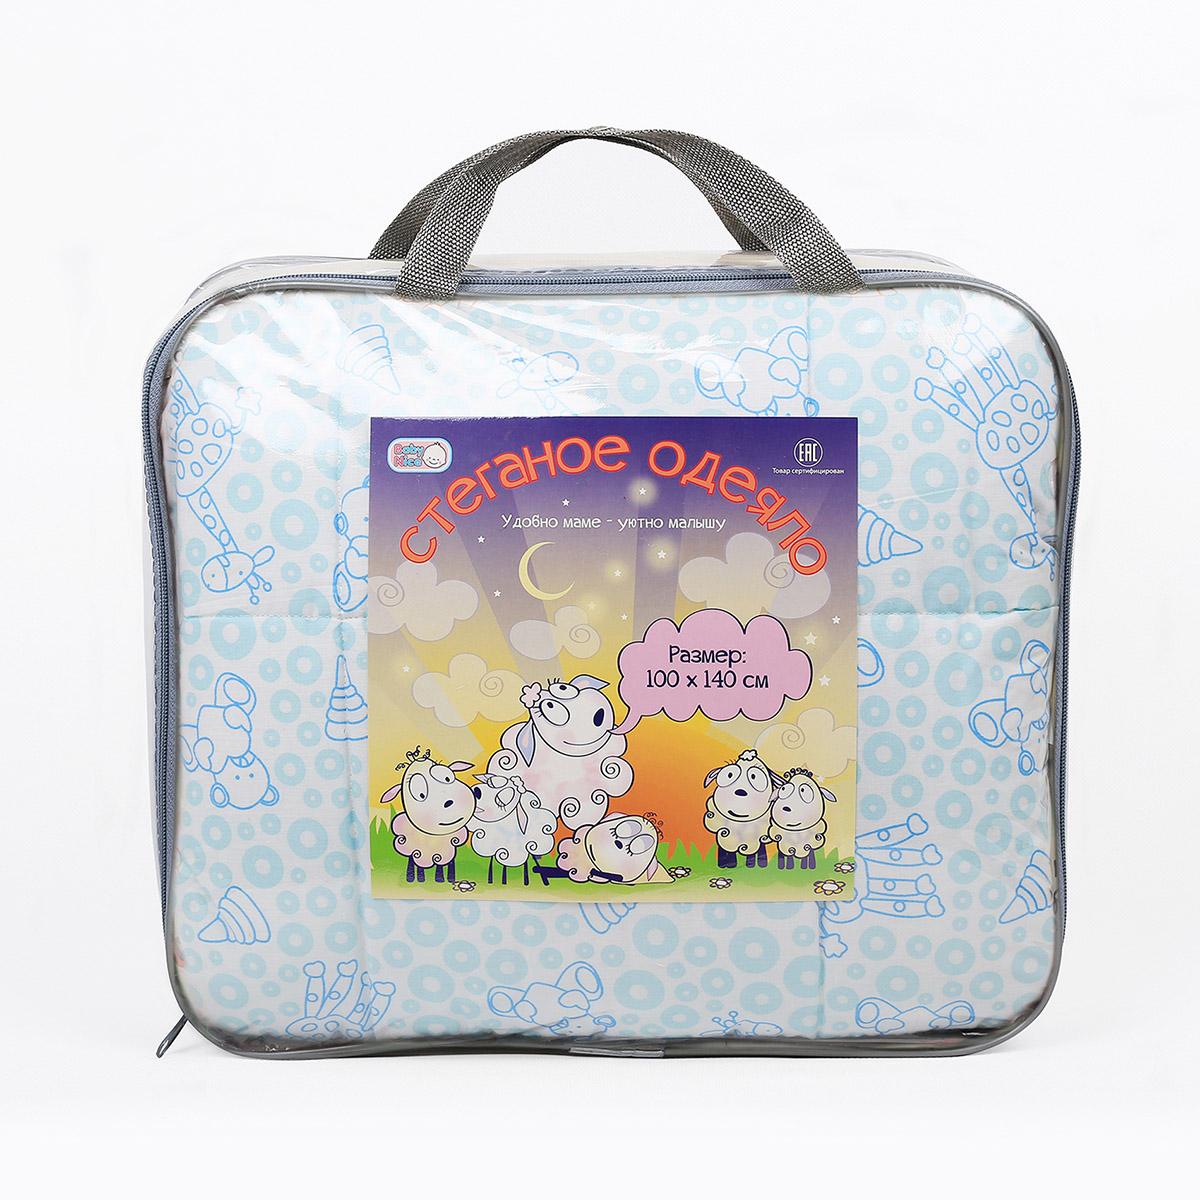 ������ Baby Nice ��������� ������ 200������������������ 105�140 ����� � ������ (�������, �������)